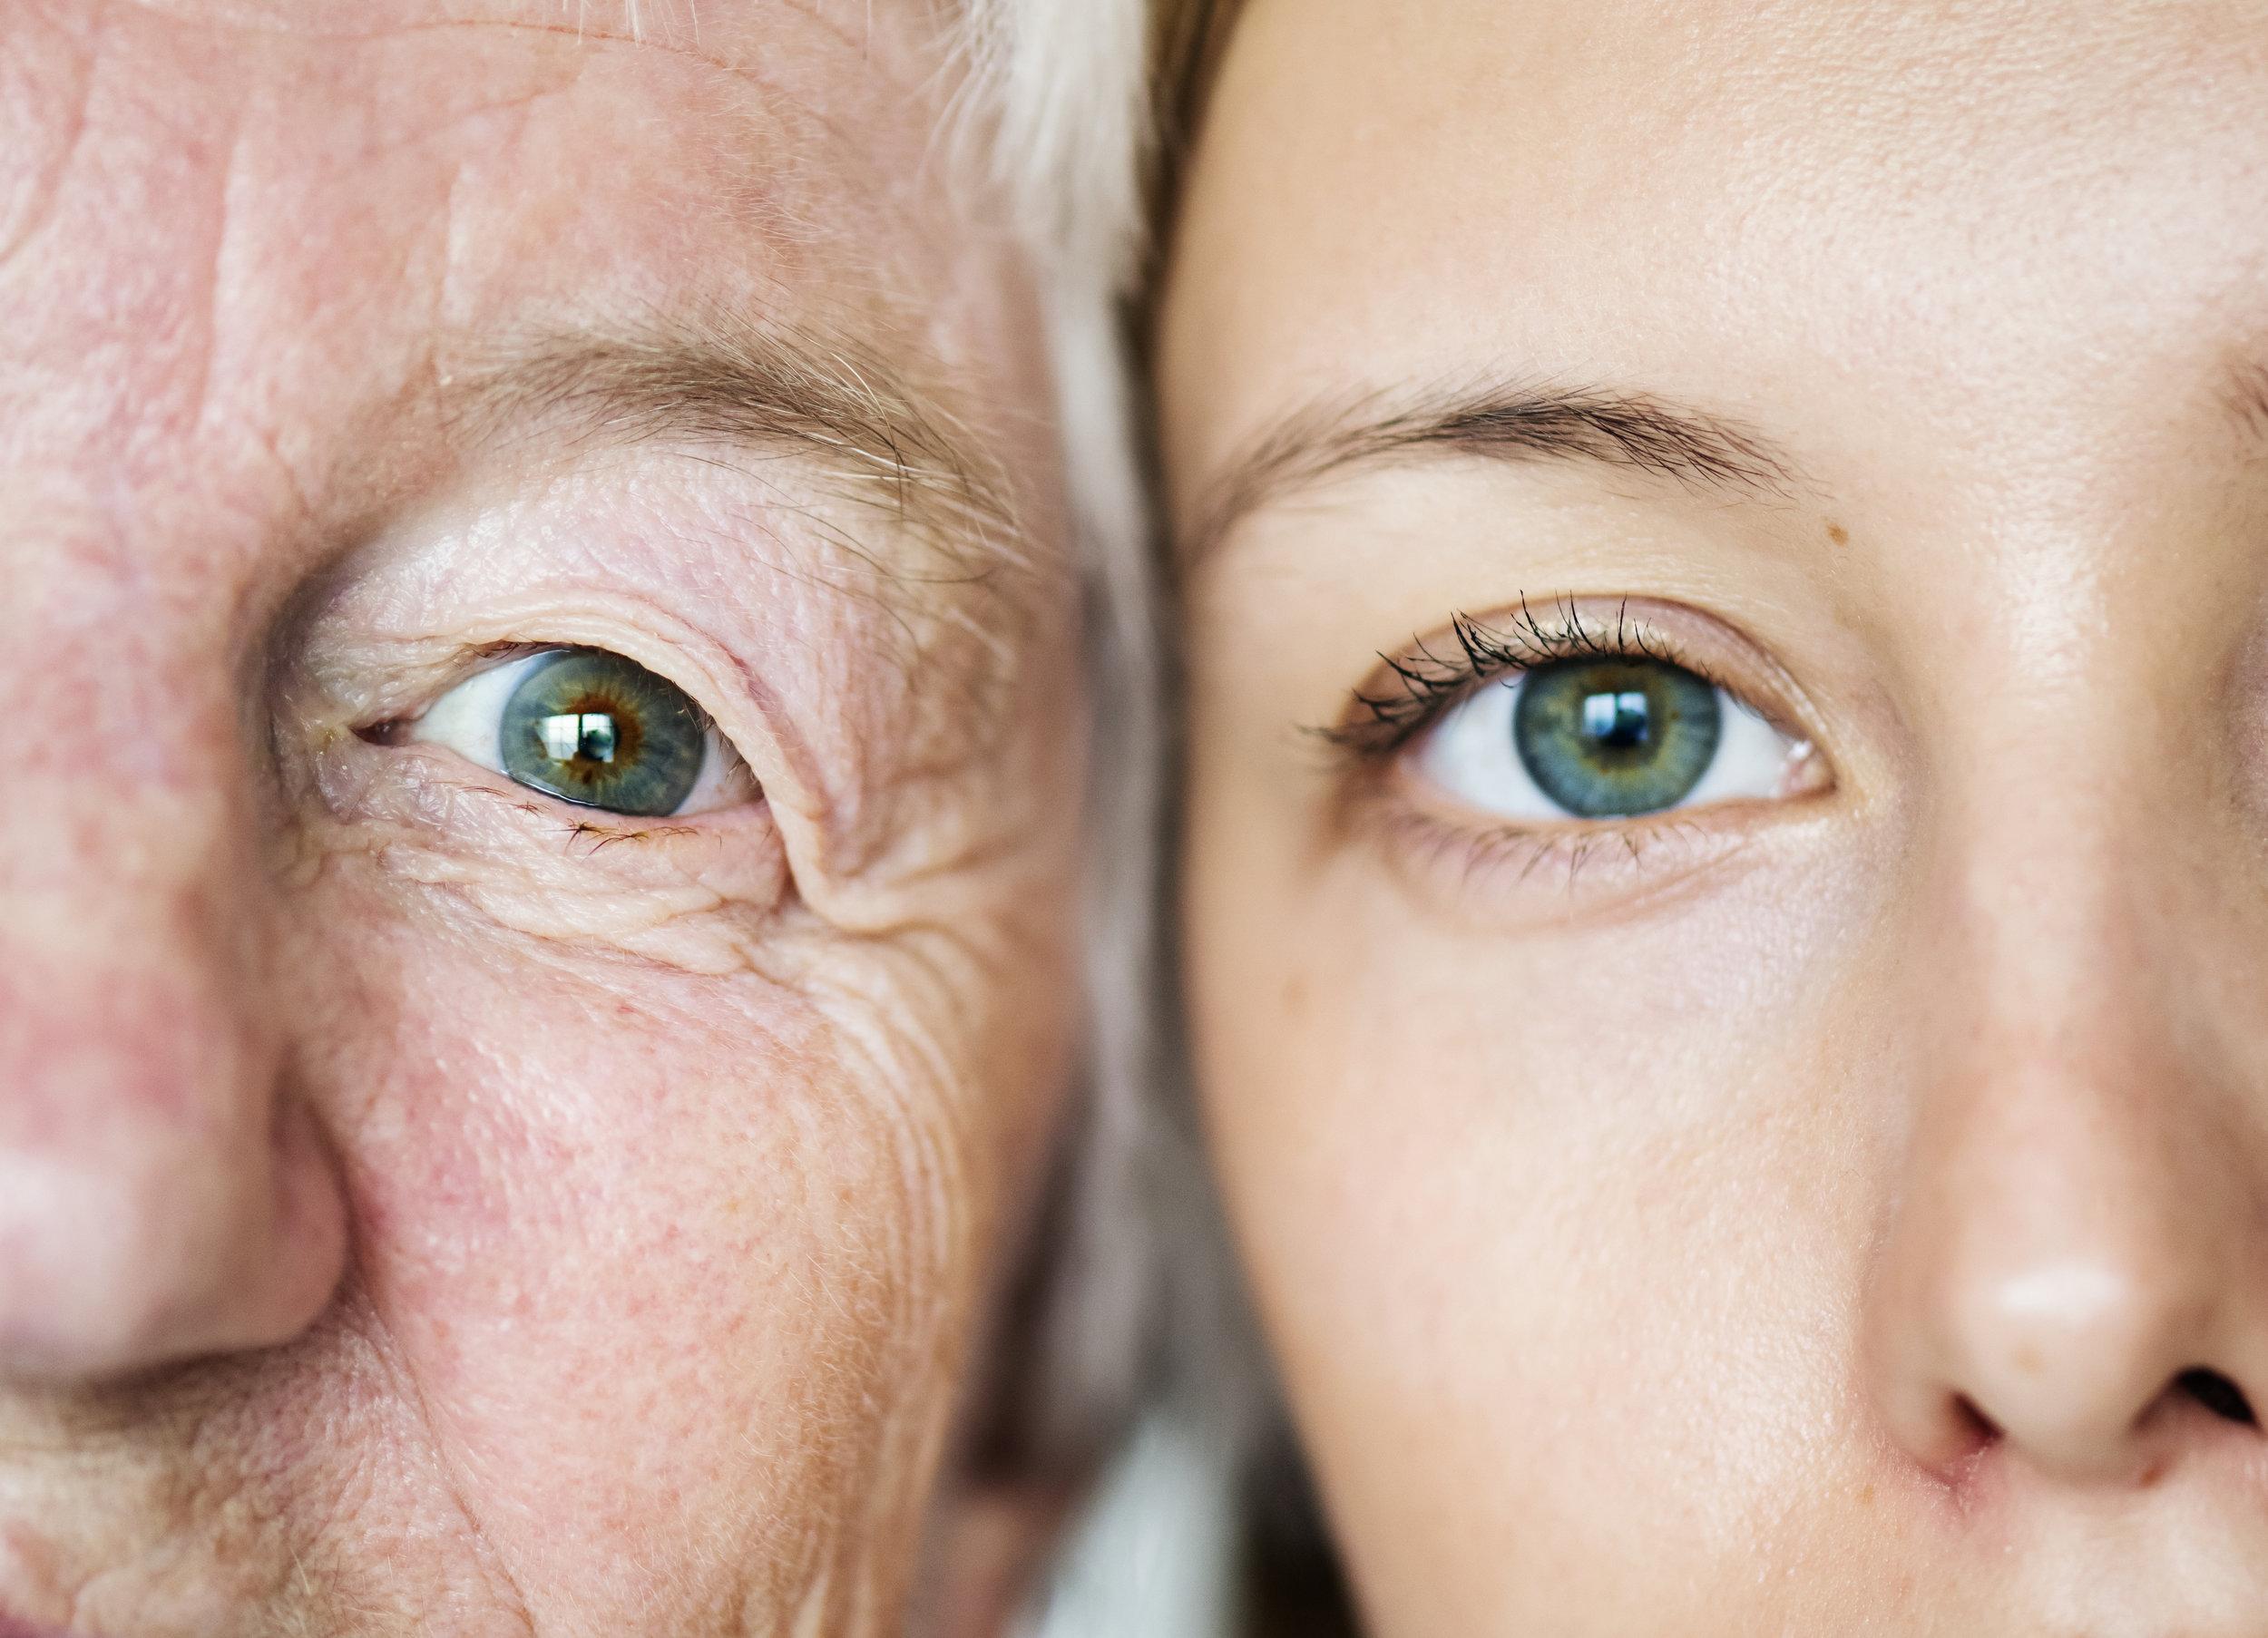 family-generation-green-eyes-genetics-concept-PZFNXVU.jpg